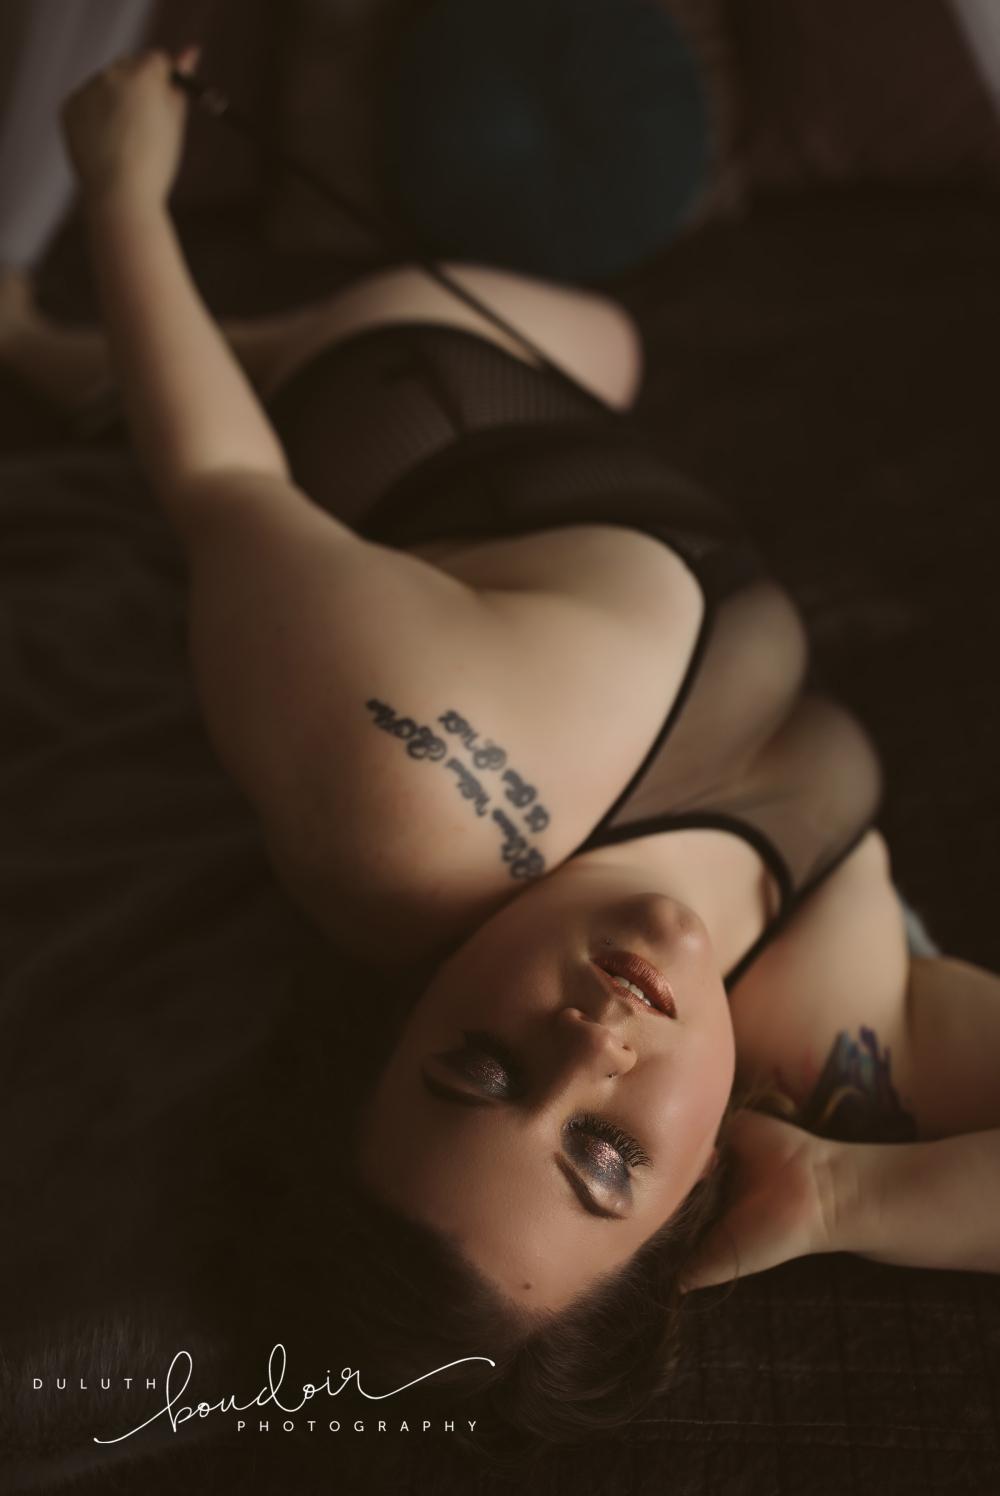 Rachel-D-Duluth-Boudoir-Photography-22.jpg